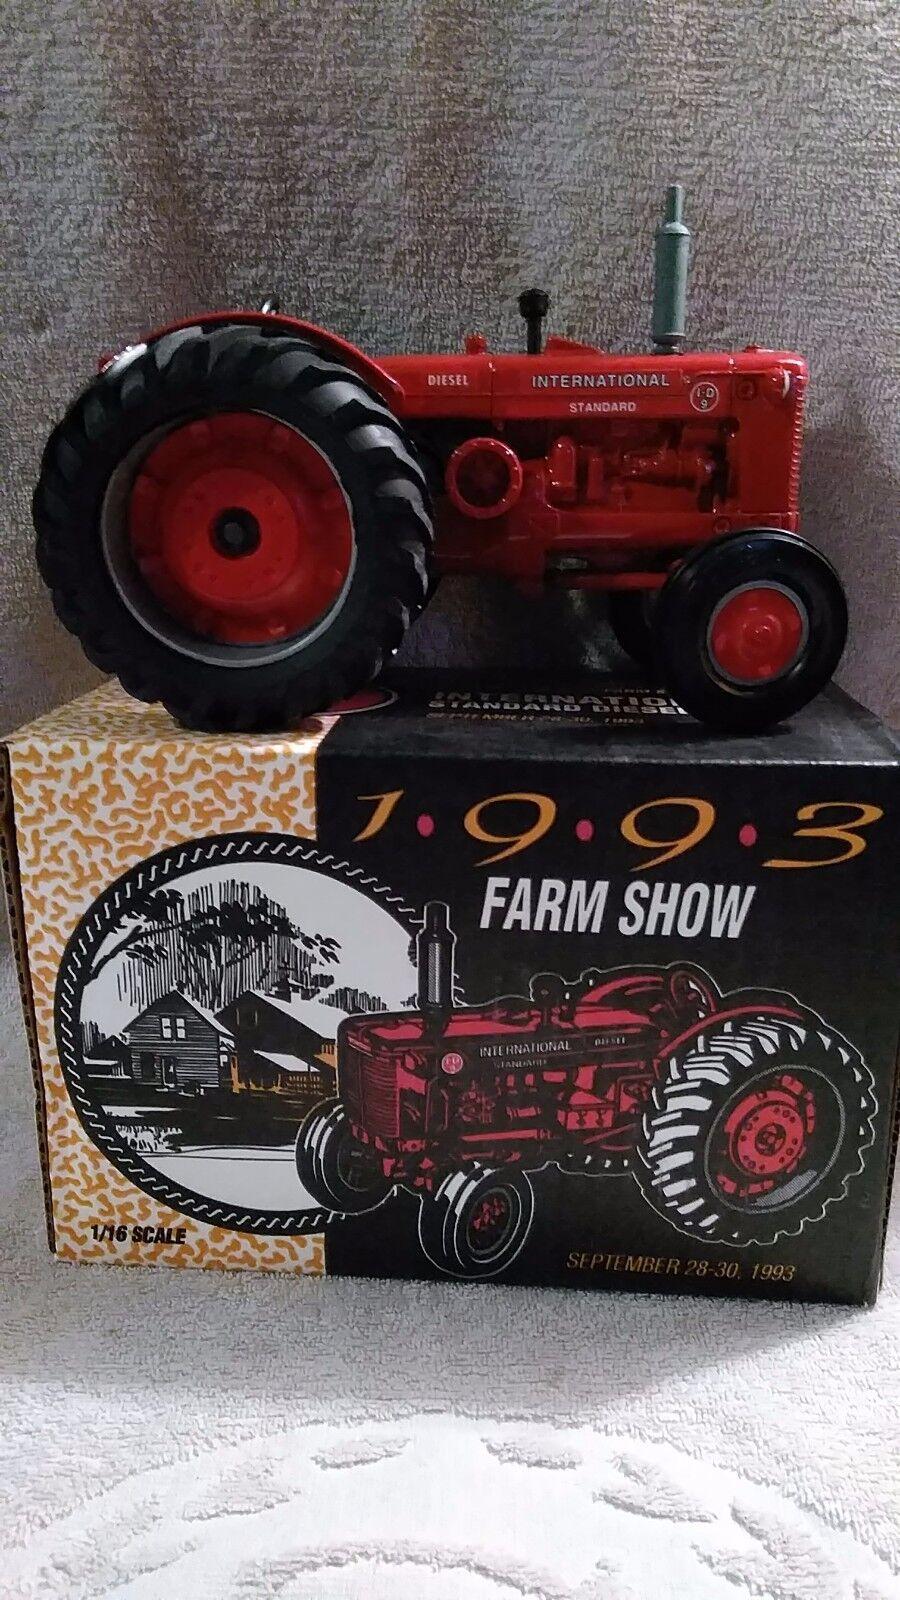 1993 Ertl 1 16 Scale Die-cast  Farm Show International ID9 Standard Diesel NIB 3